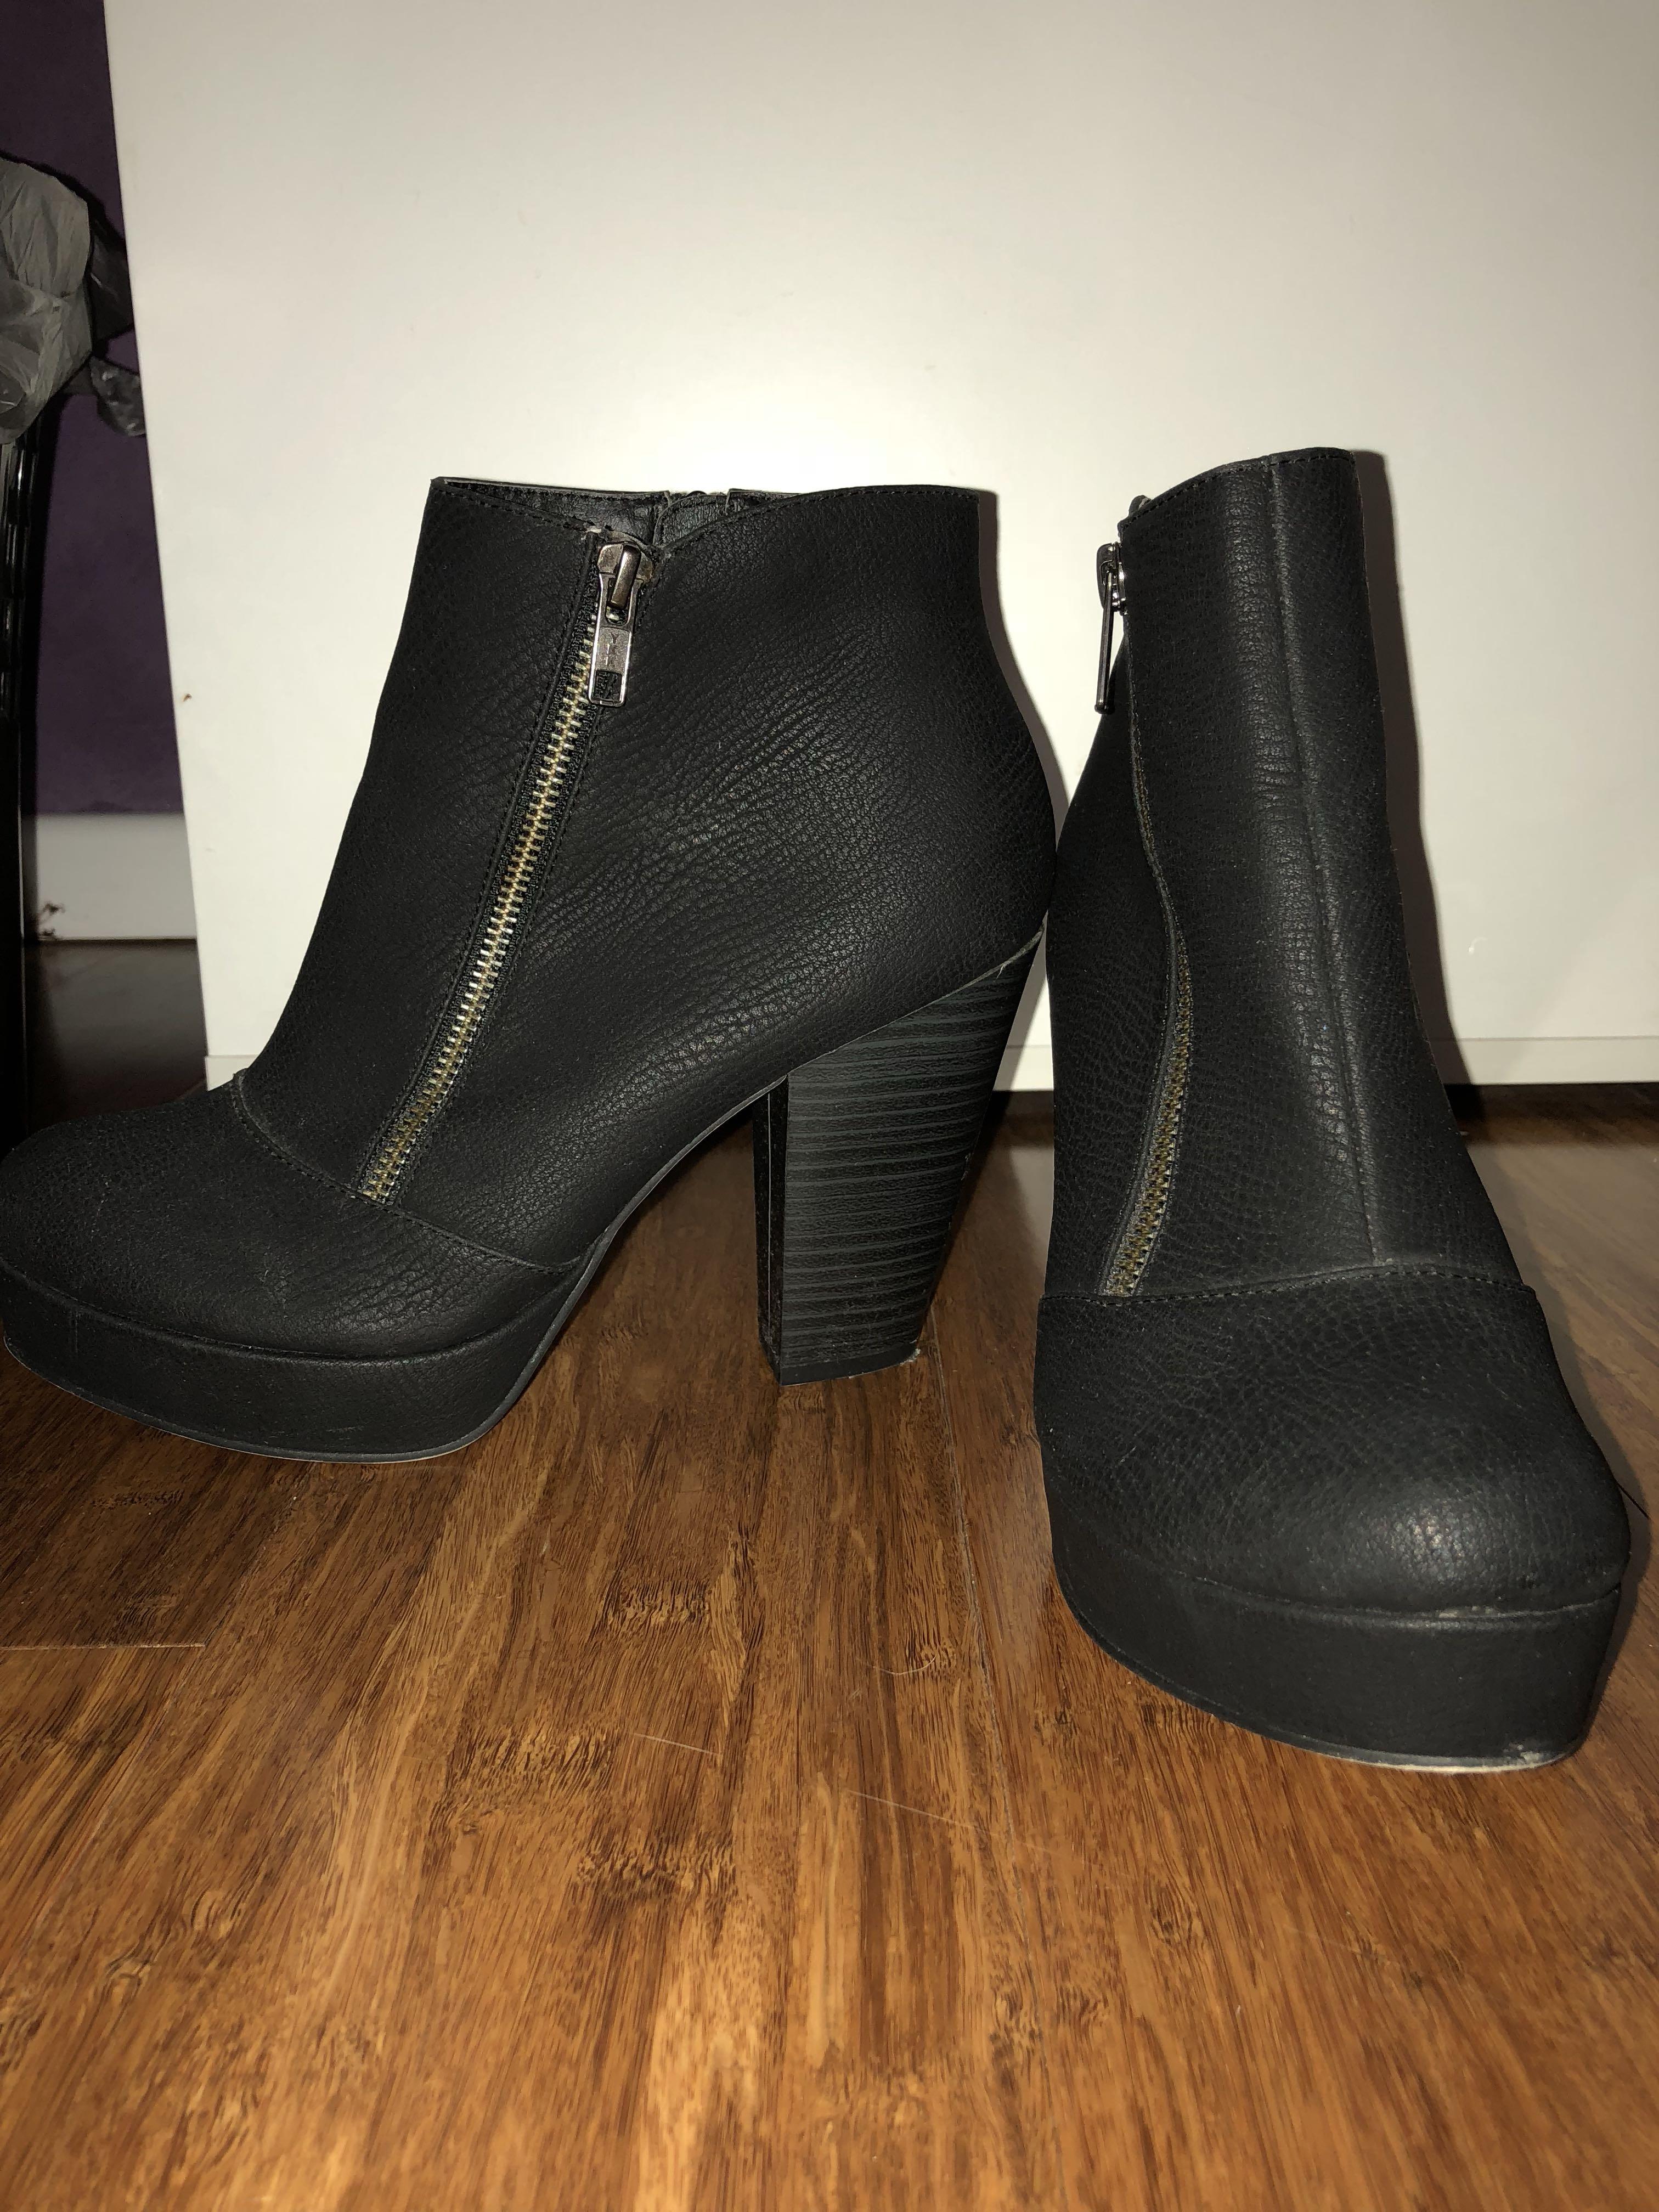 Betts heeled boots